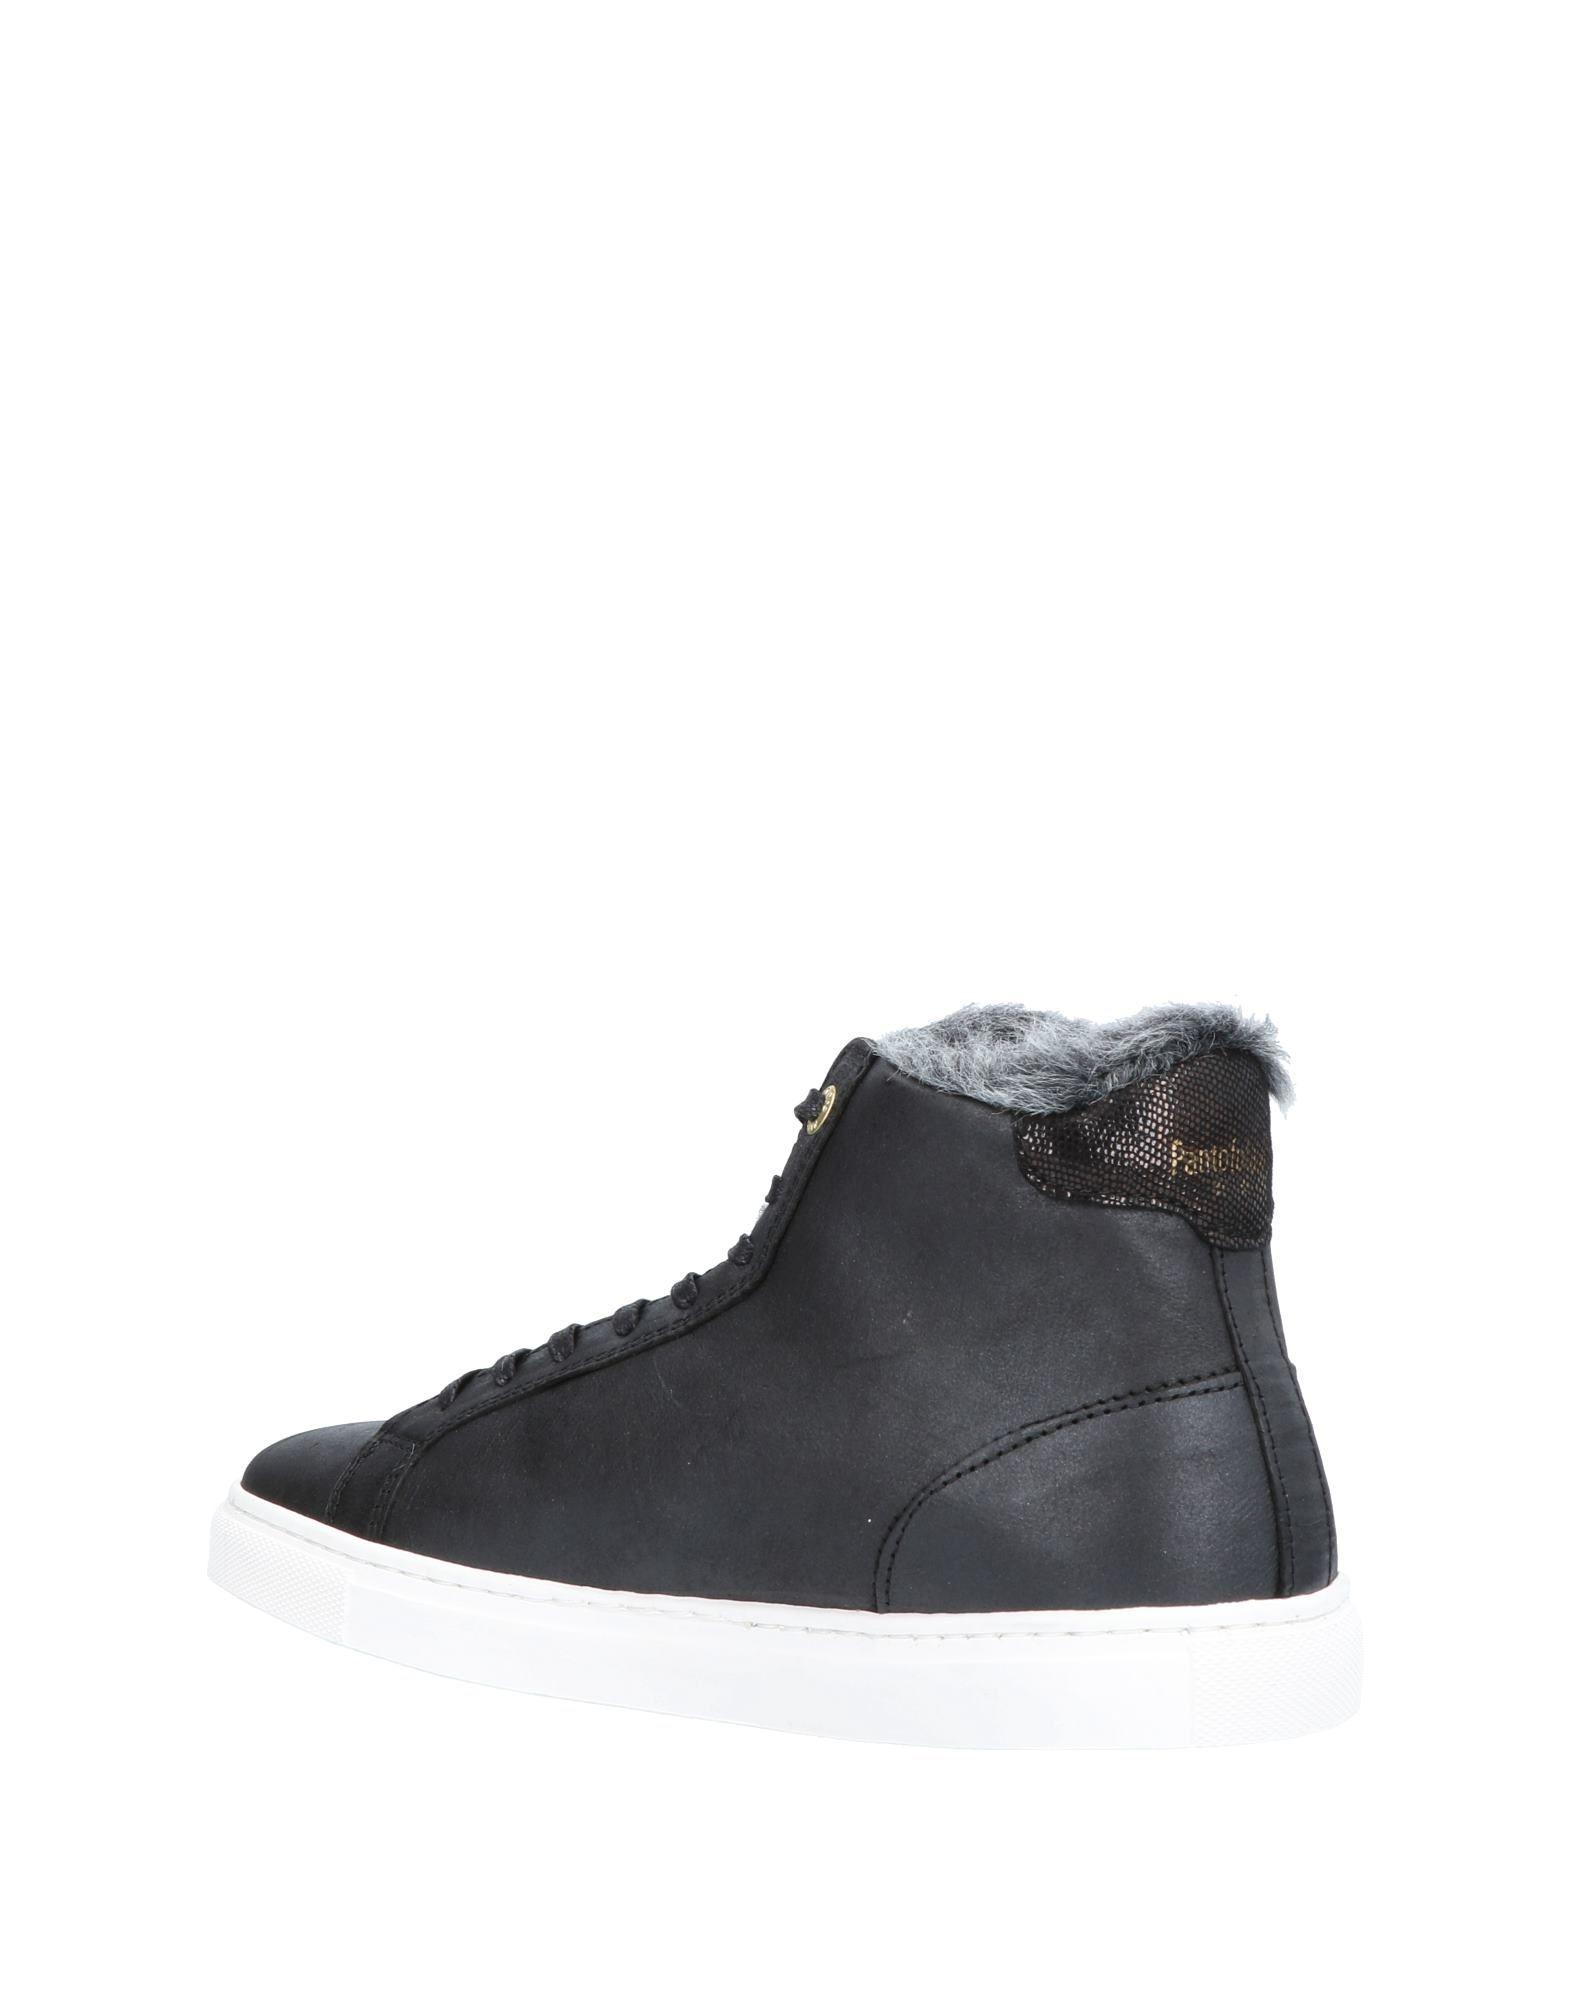 Pantofola D'oro Sneakers Qualität Damen  11456377DL Gute Qualität Sneakers beliebte Schuhe 8ddd6e